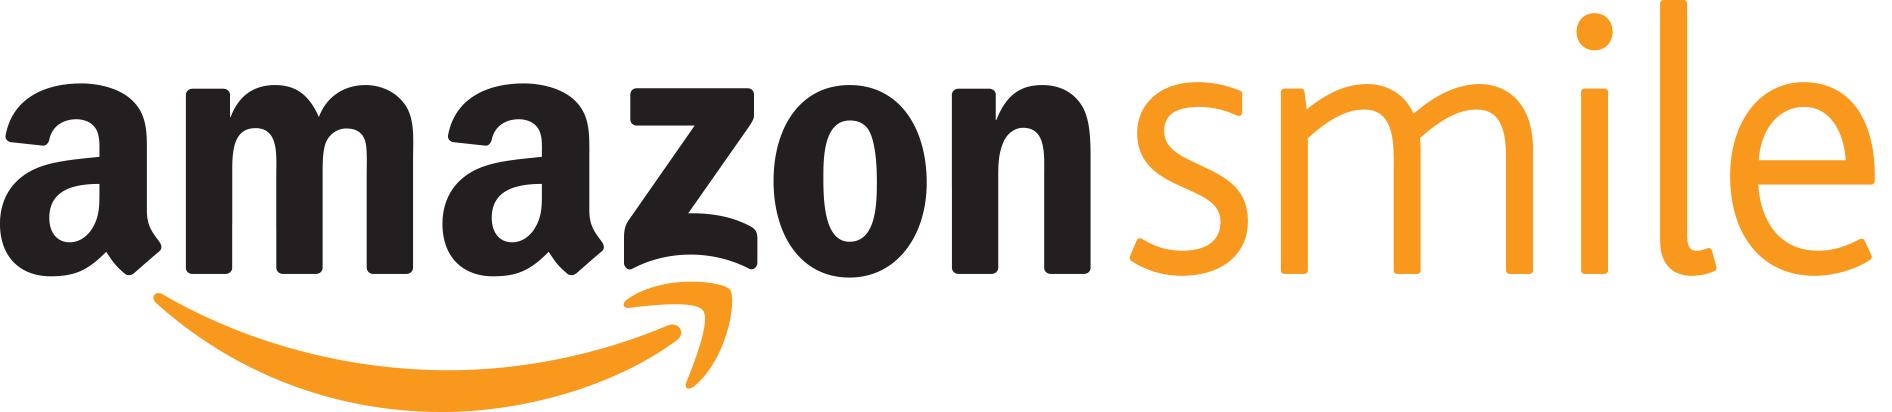 AmazonSmile_screen_no_tagline.png